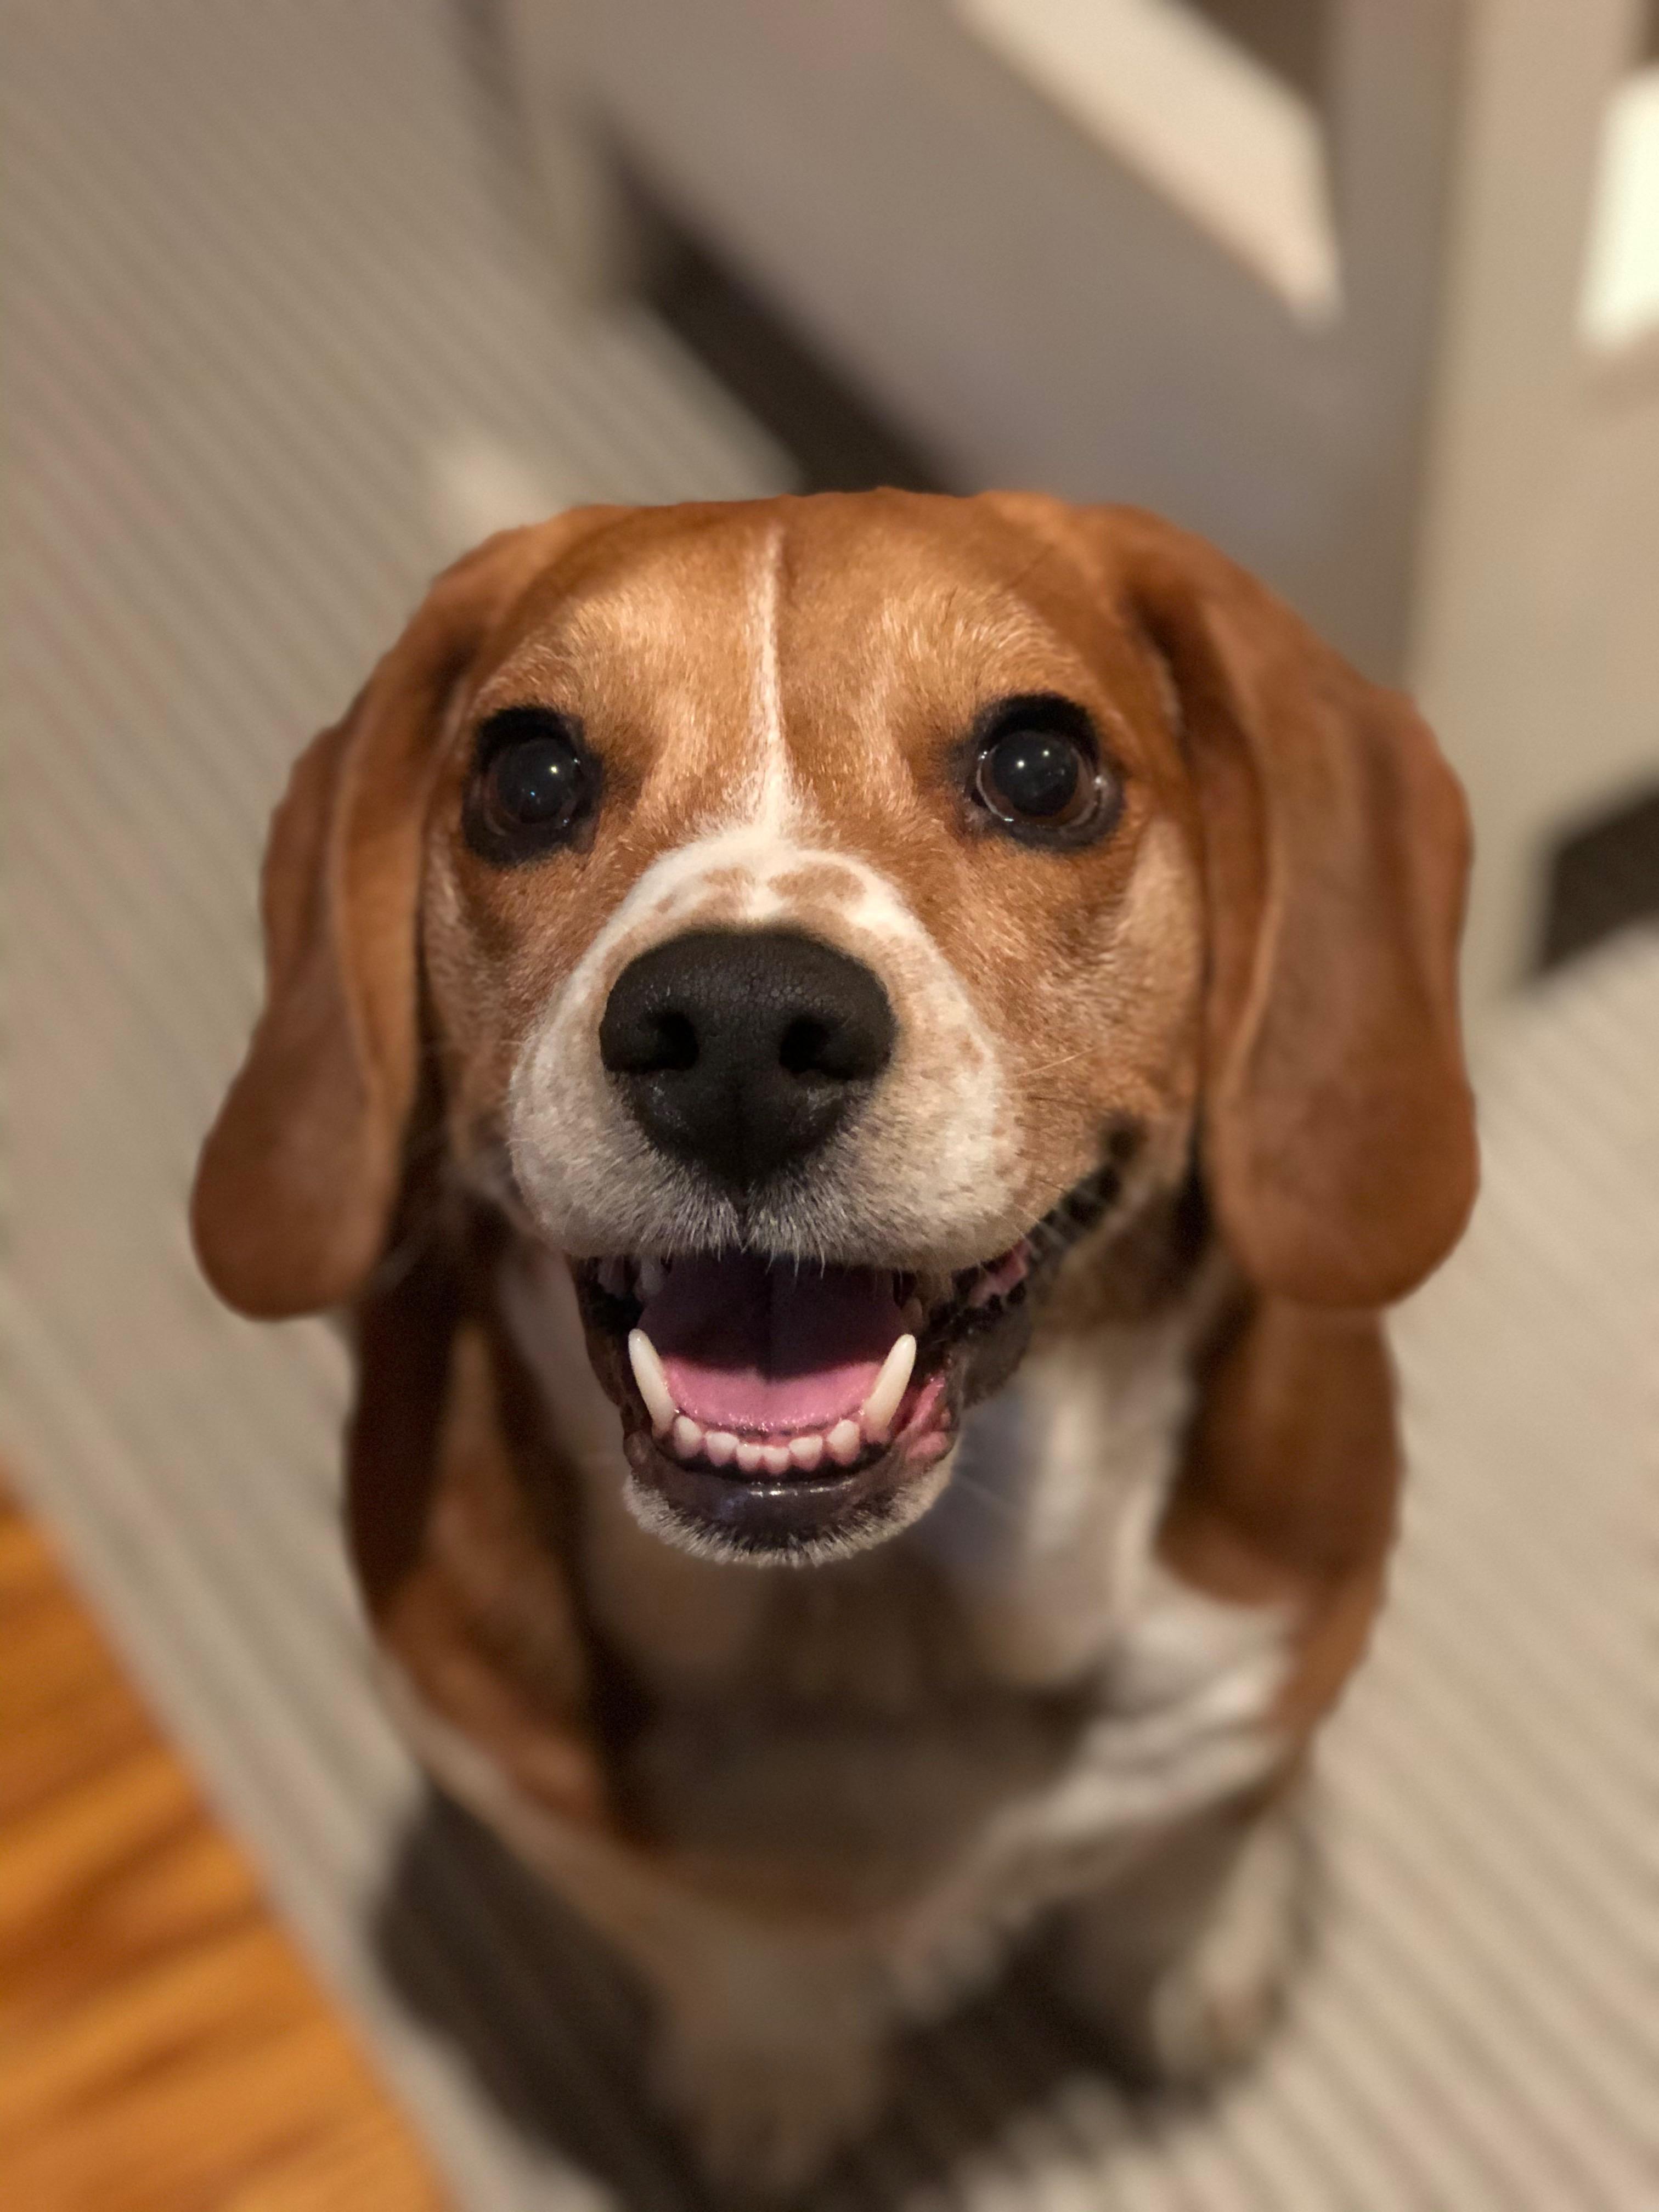 https//i.redd.it/6q877ii43zk41.jpg in 2020 Cute beagles